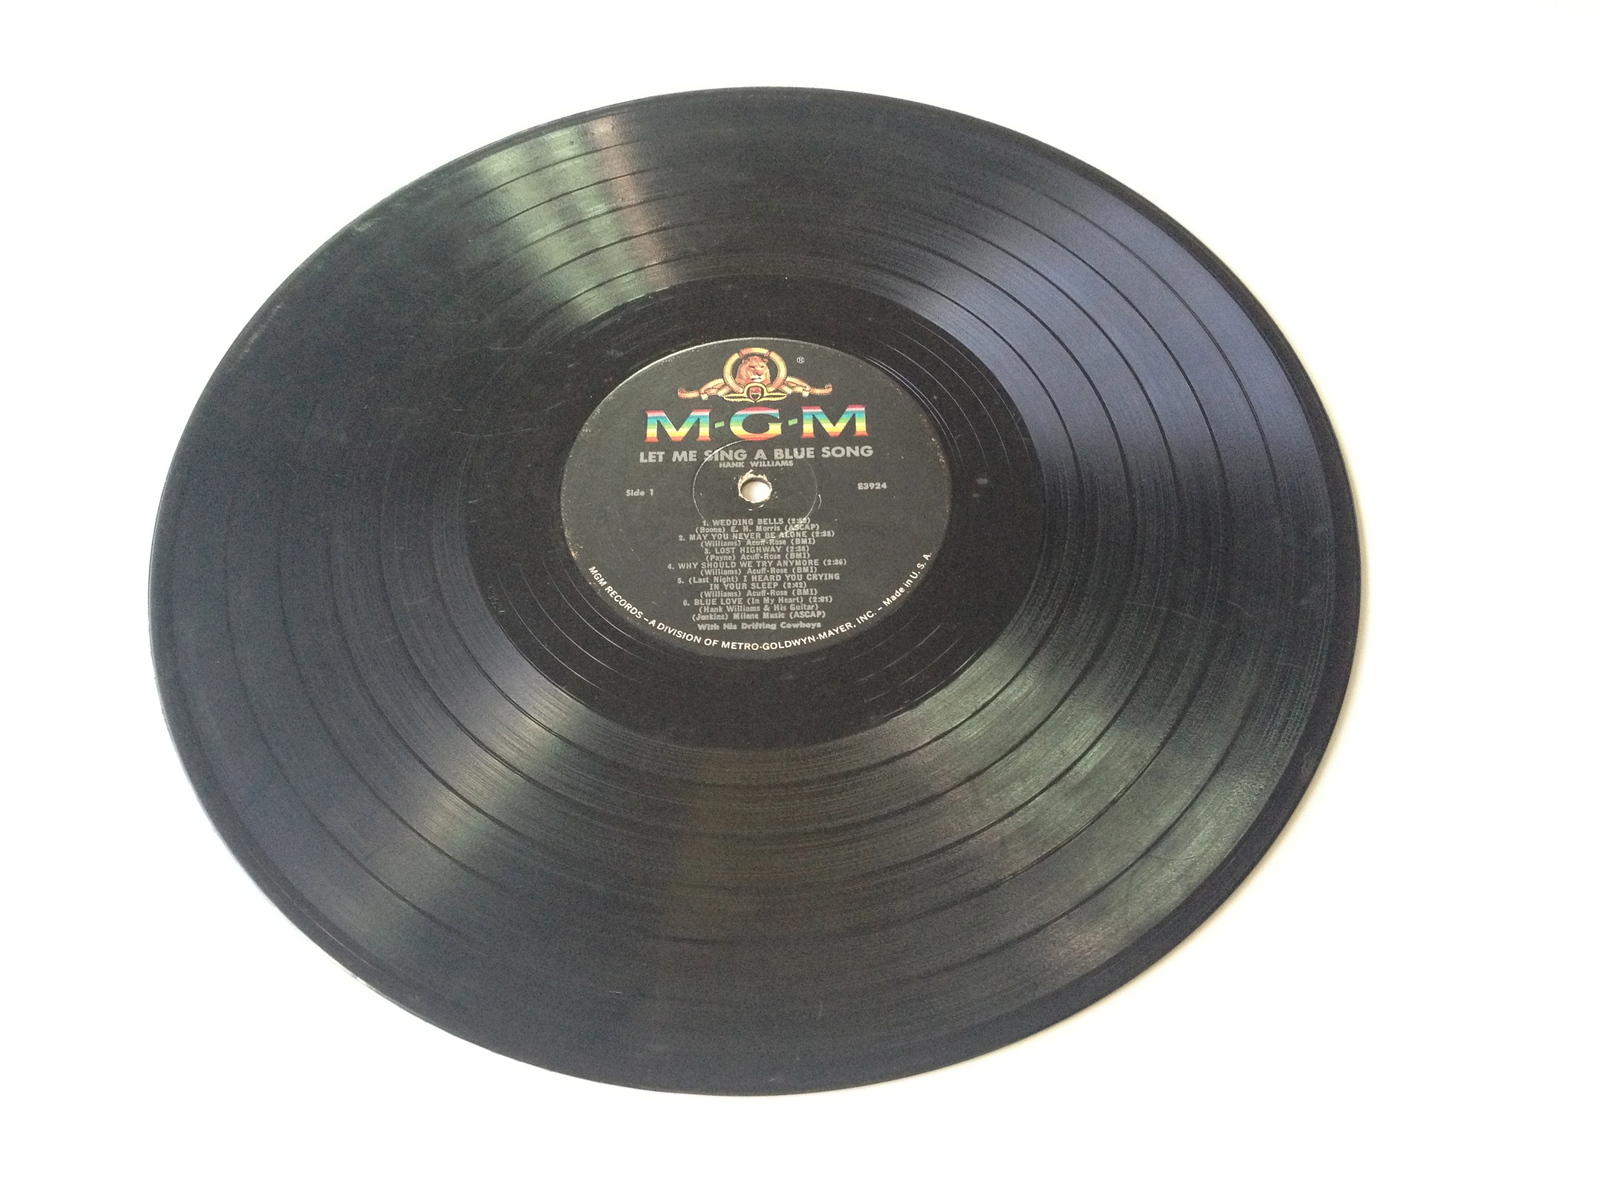 Hank Williams - Let Me Sing A Blue Song LP Vinyl Record Album, 1961